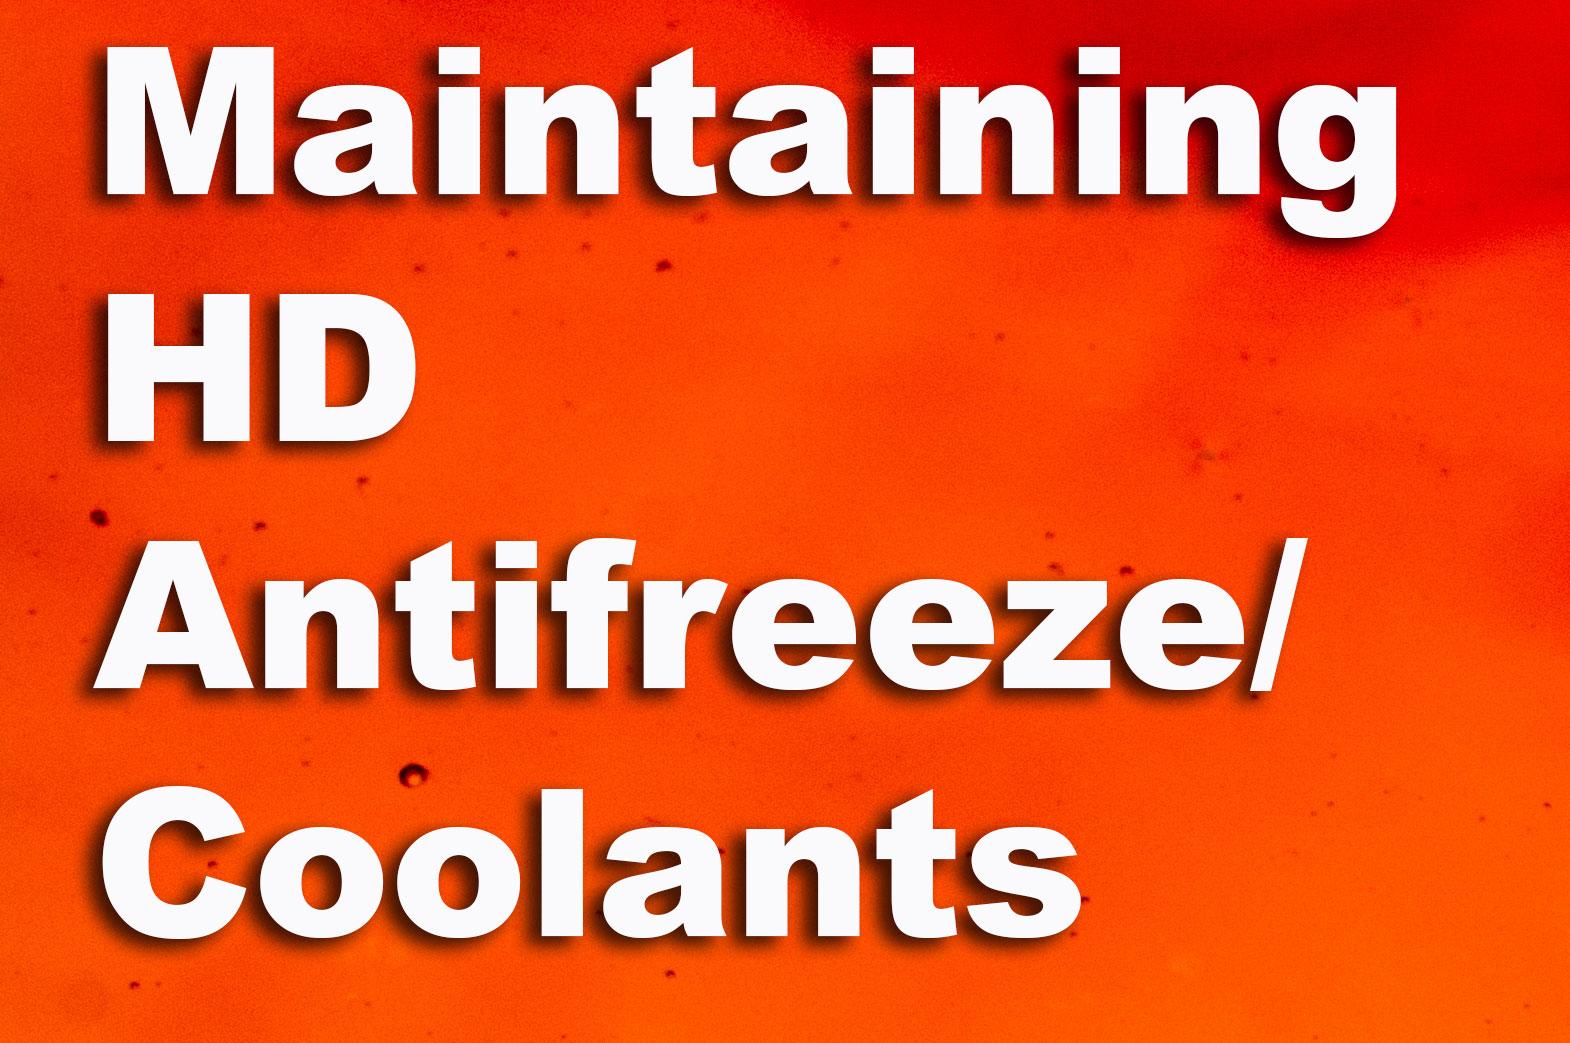 Maintaining HD Antifreeze/Coolants